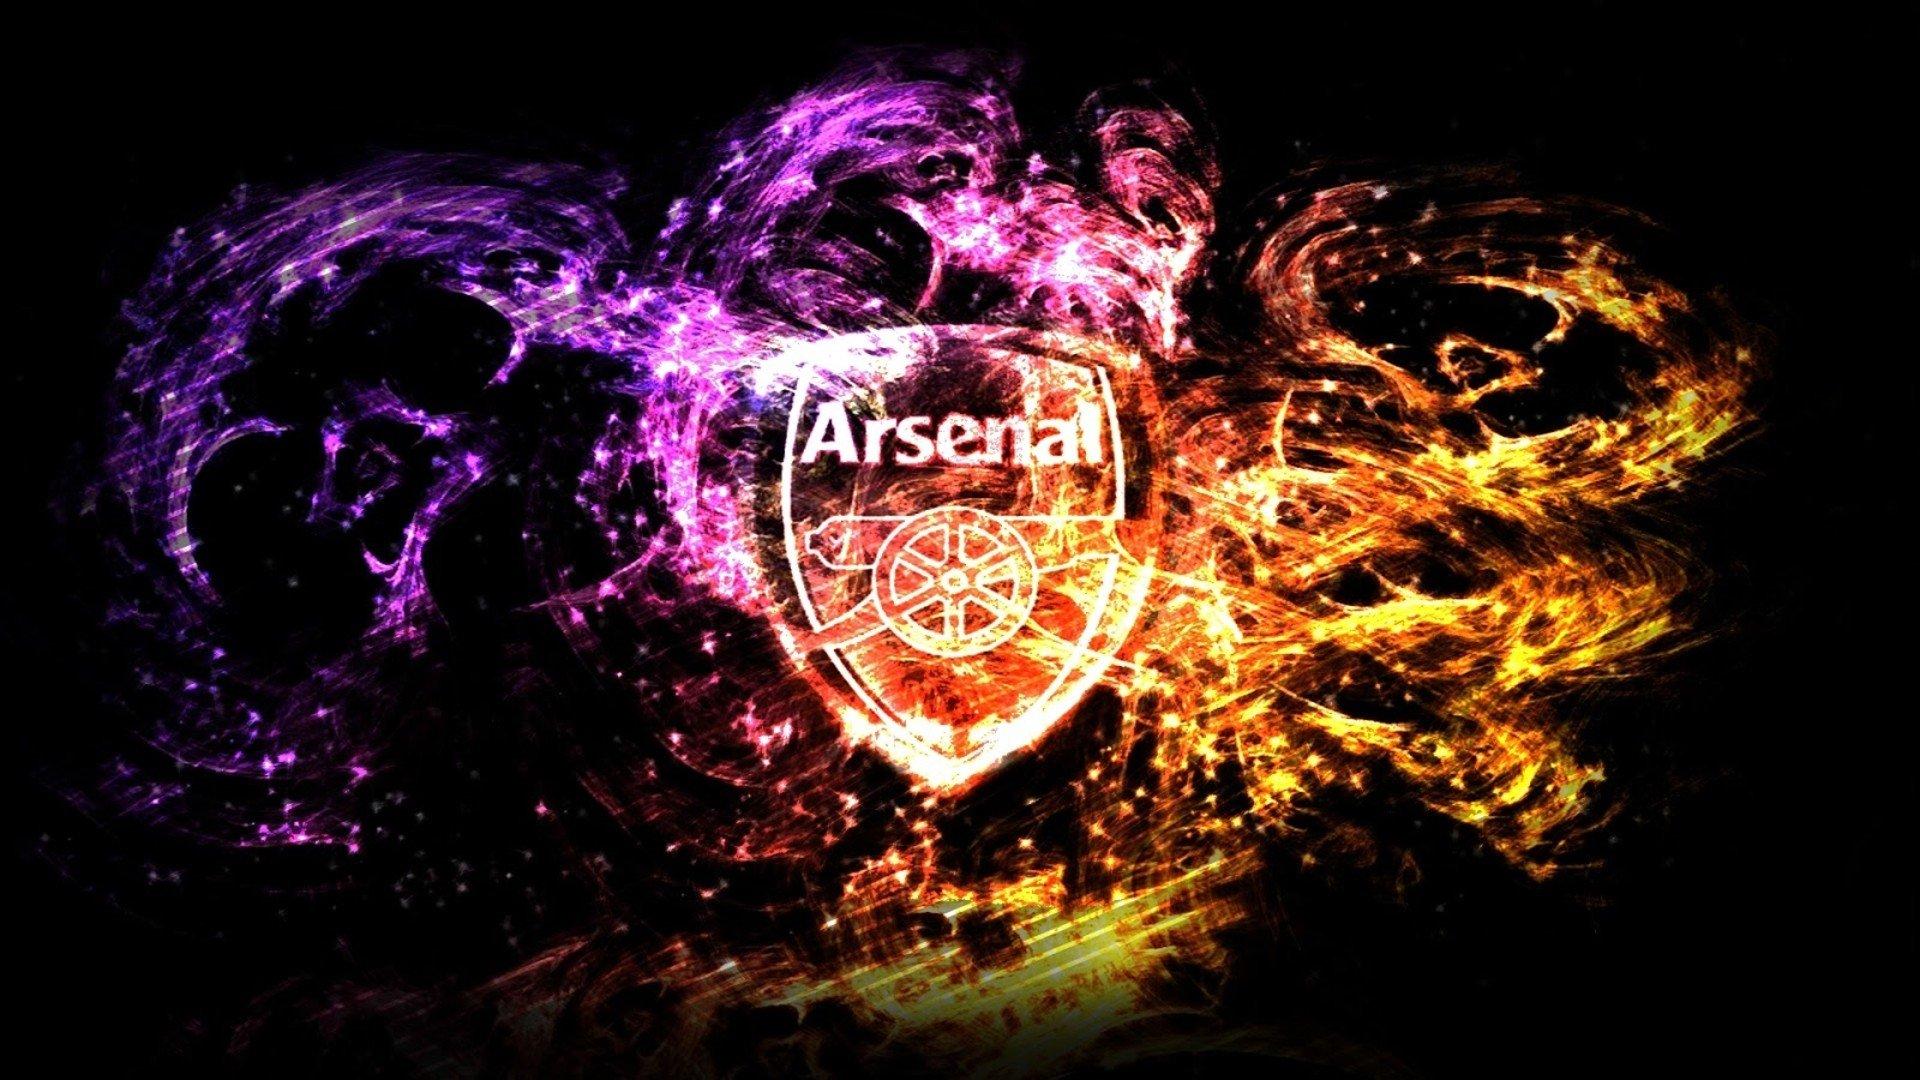 arsenal Football Logos wallpaper 1920x1080 288542 WallpaperUP 1920x1080